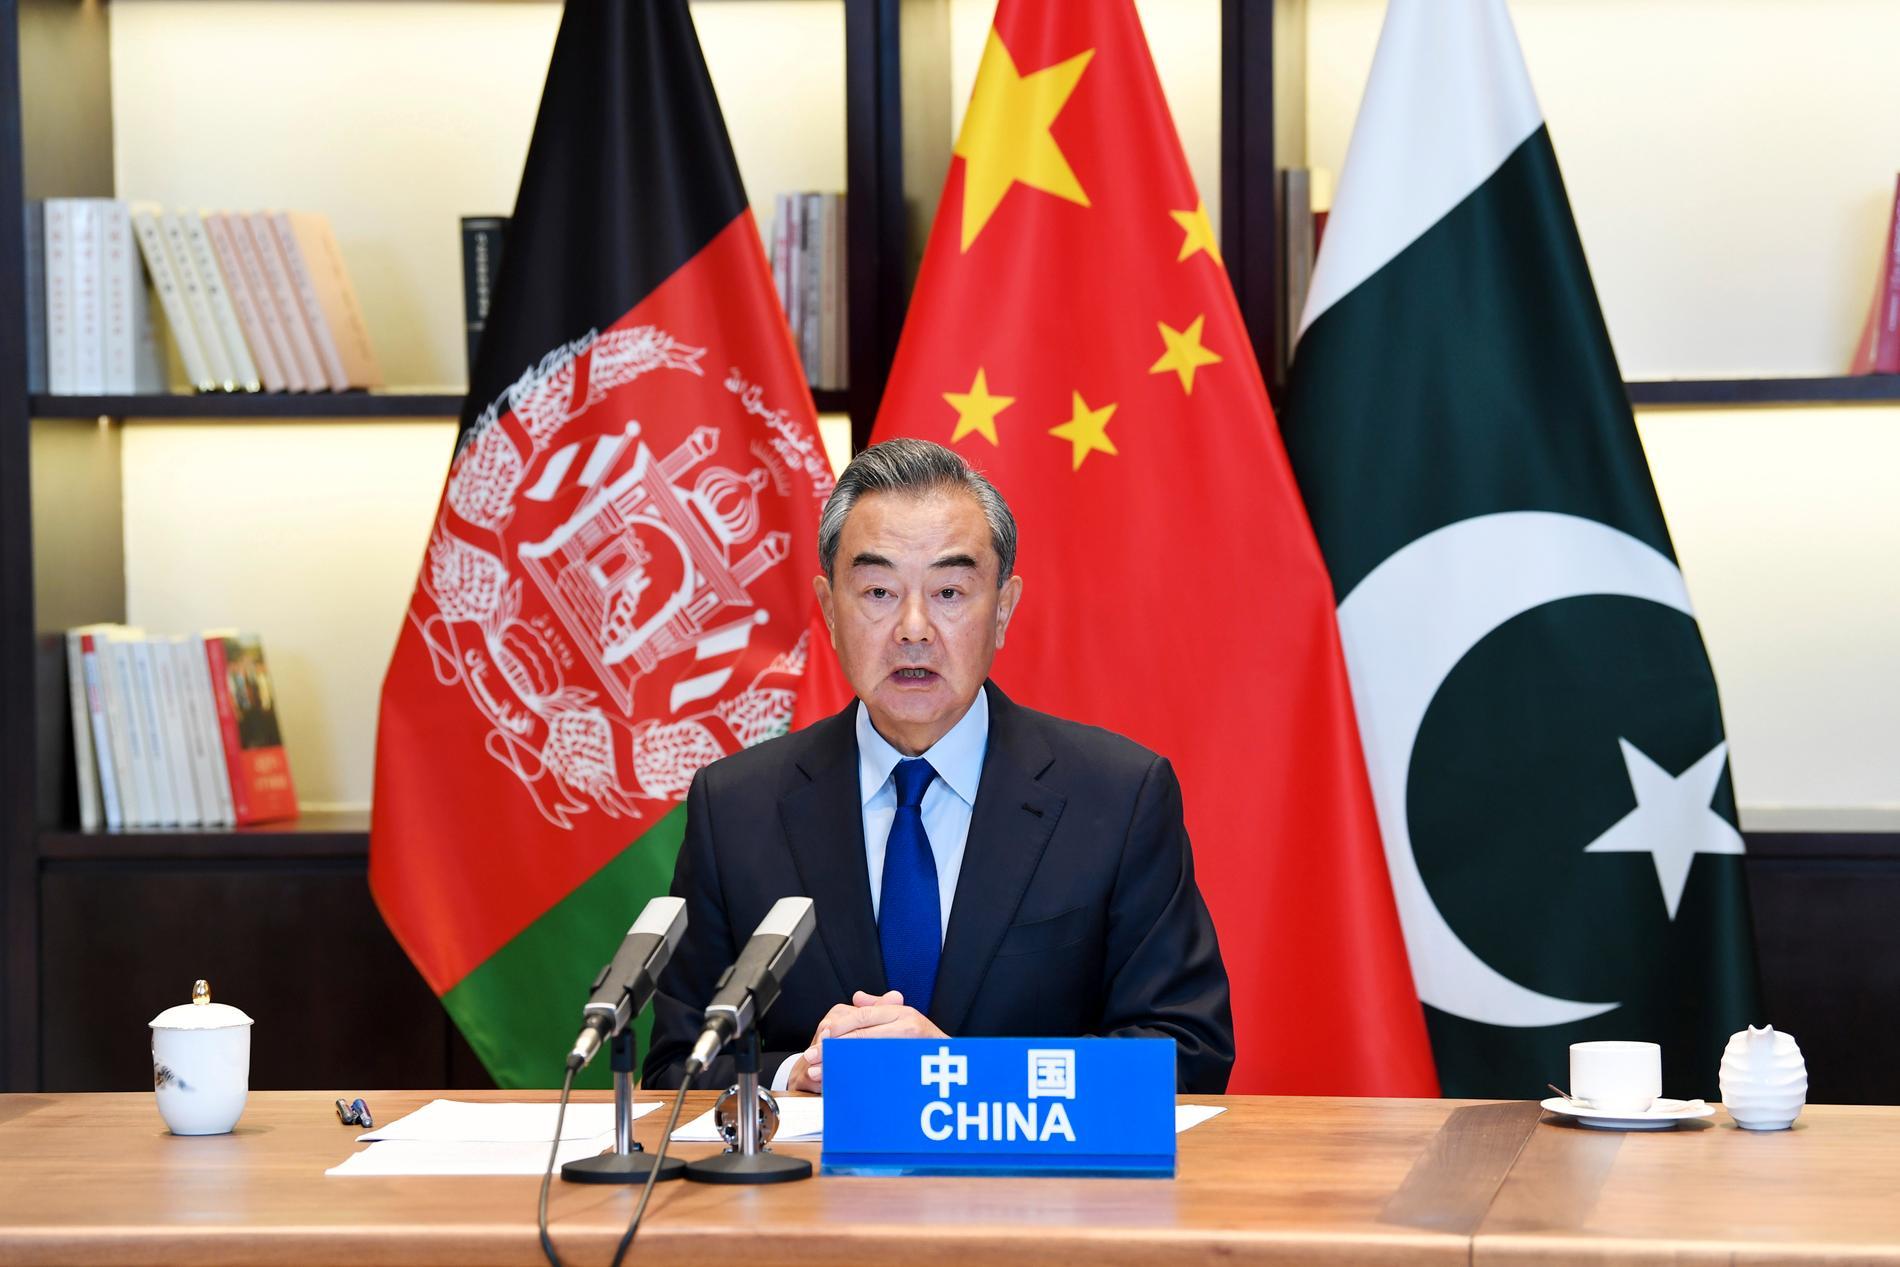 Kinas utrikesminister Wang Yi vid en konferens mellan Kina, Afghanistan och Pakistan i juni.